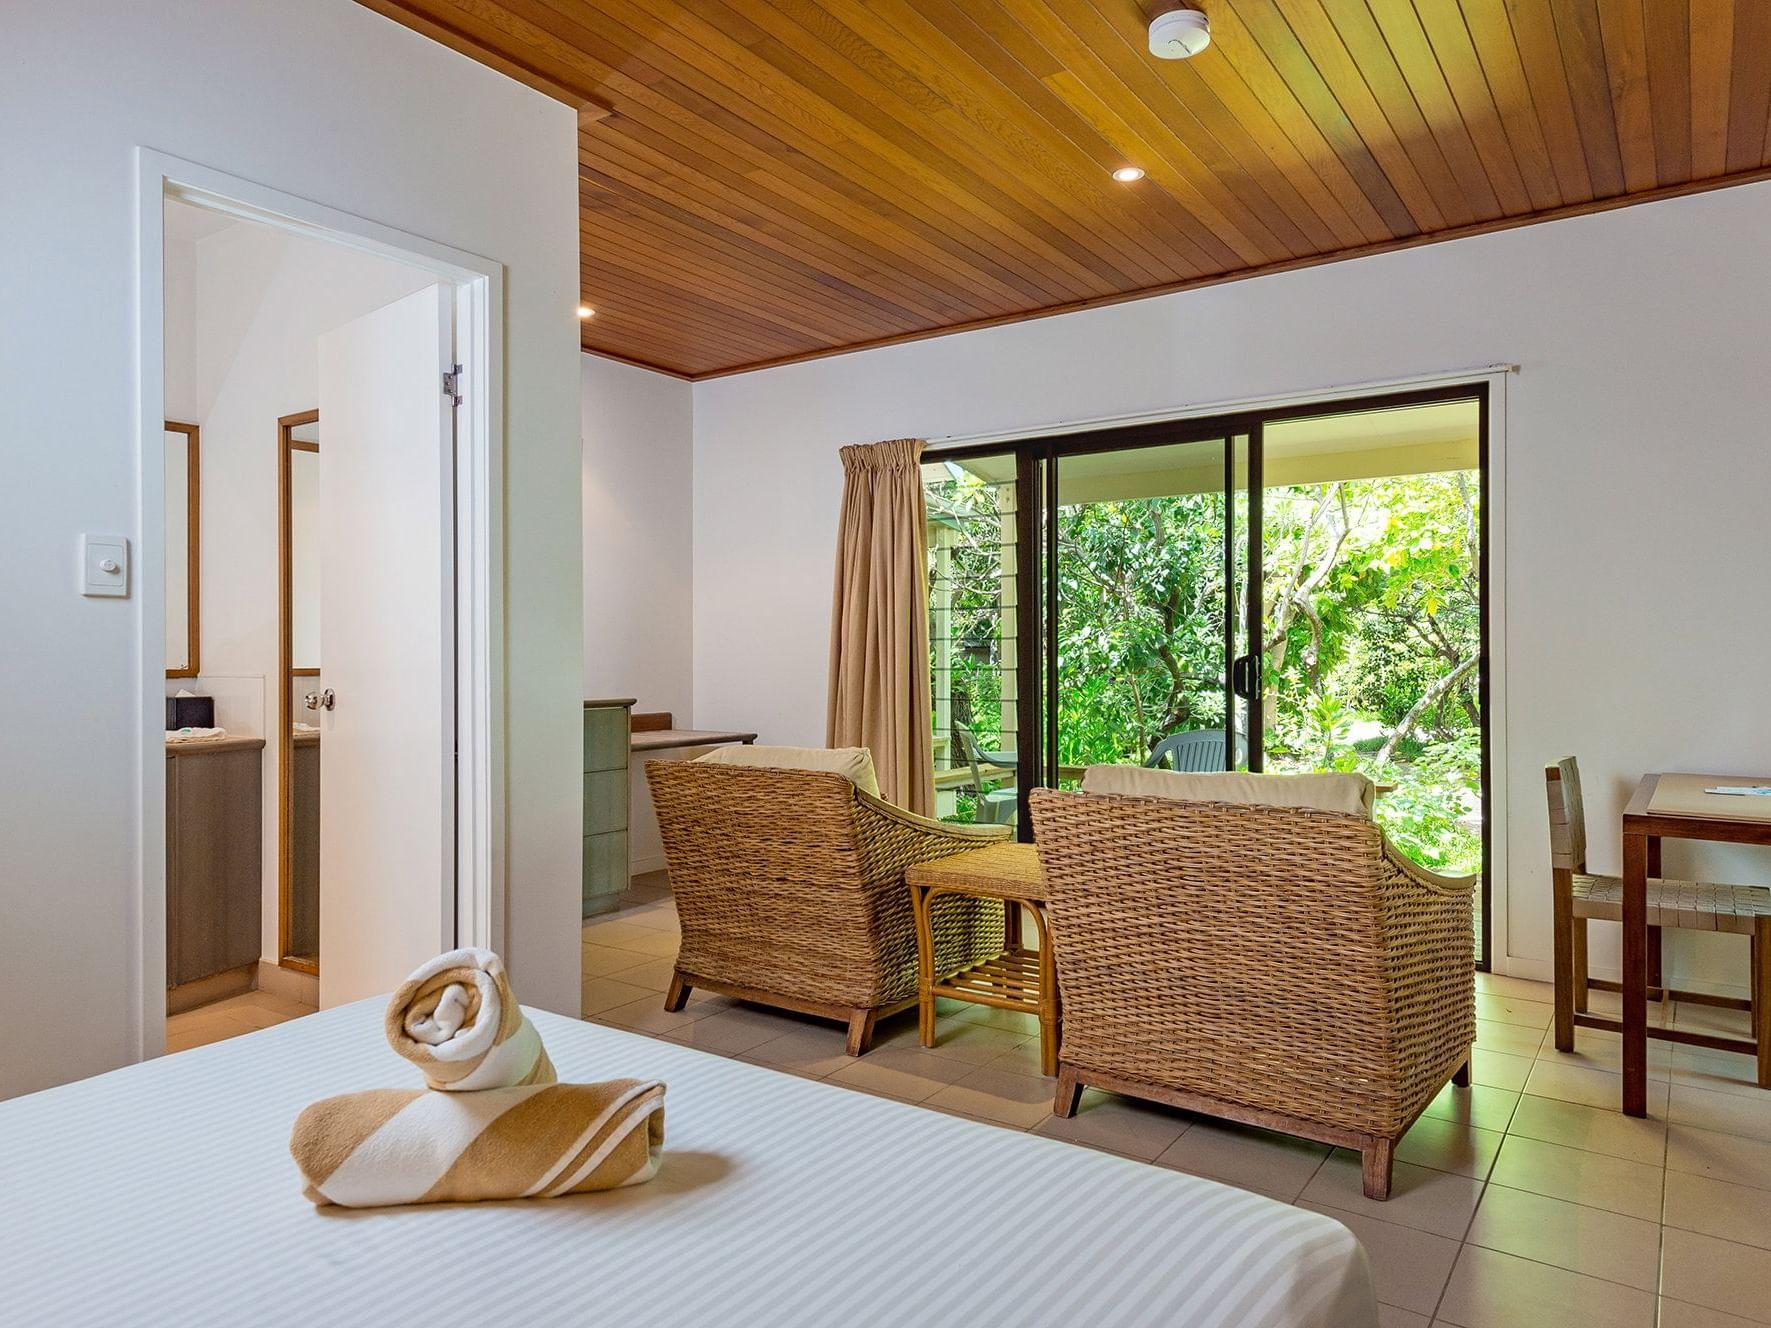 Turtle Room at Heron Island Resort in Queensland, Australia